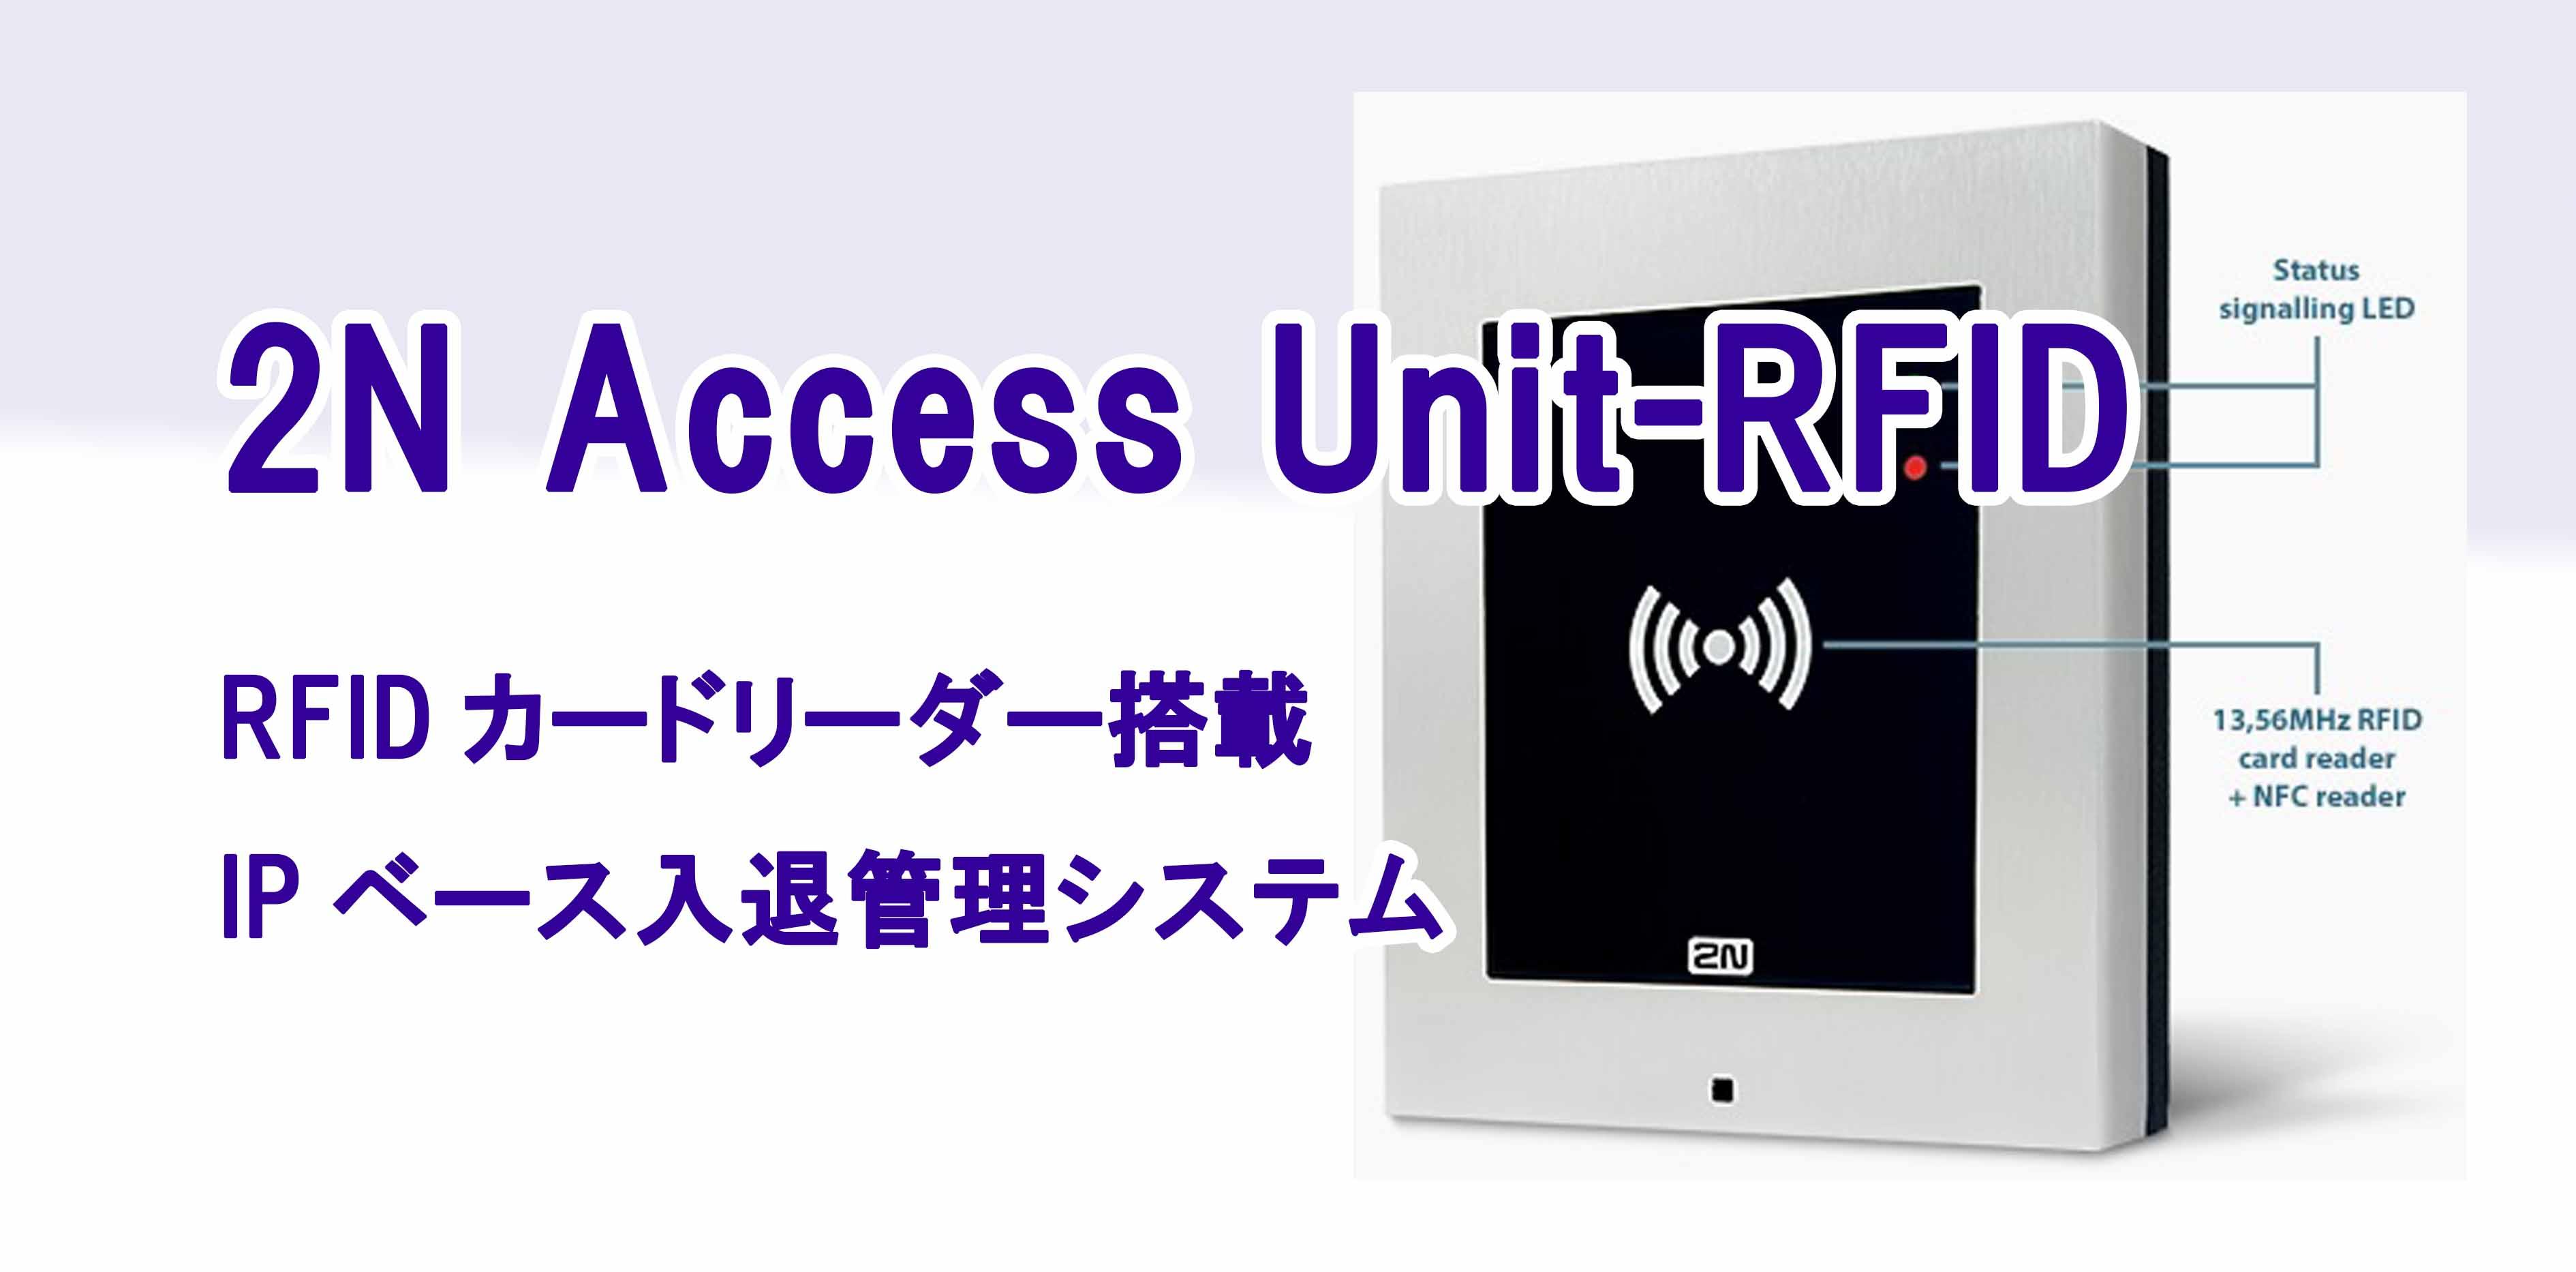 Access_Unit_RFID